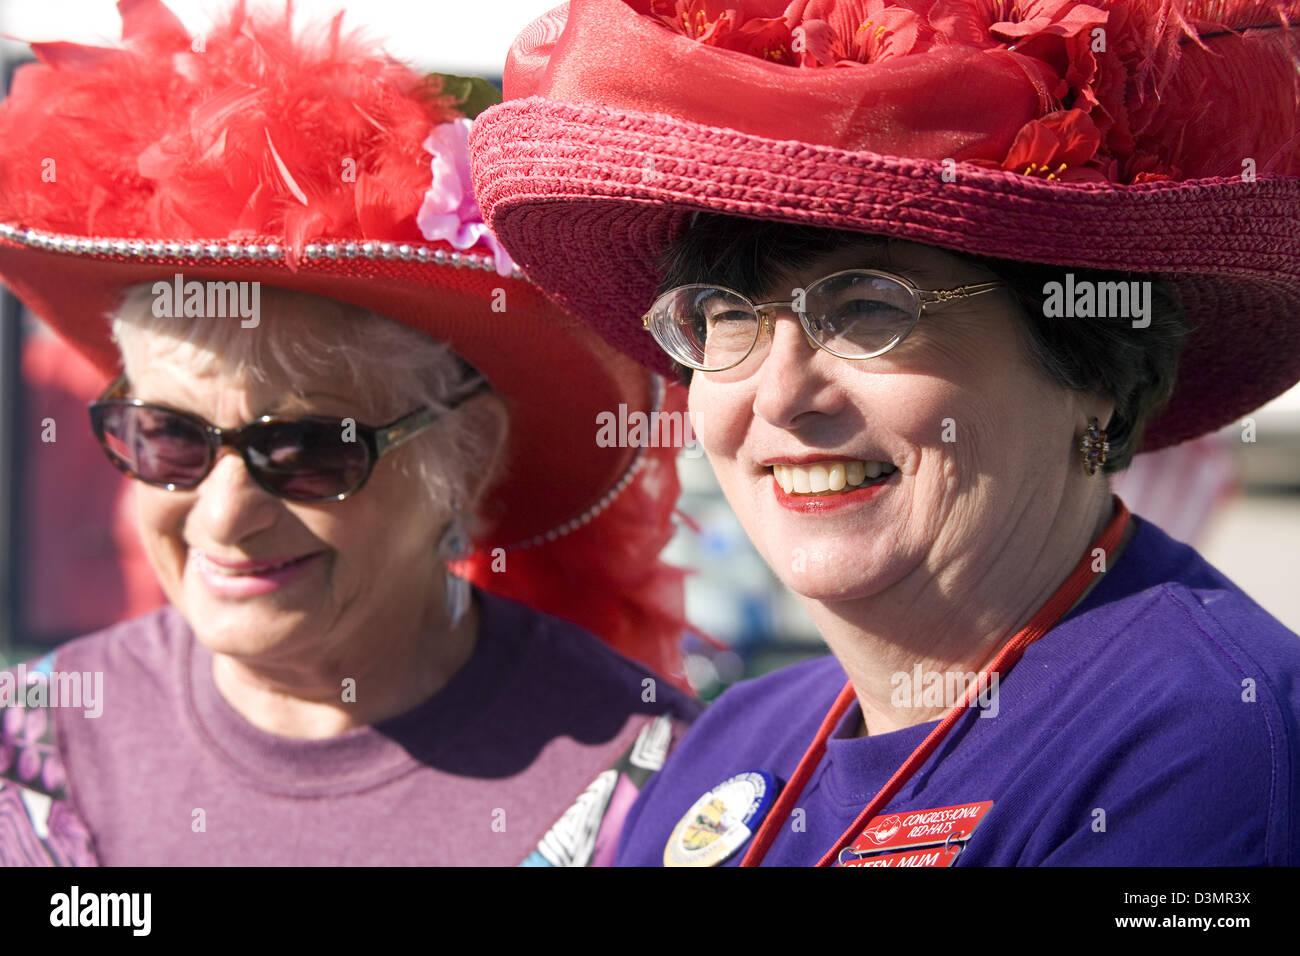 Big red hats, Death Valley 49er Encampment Parade, Death Valley National Park, CA, USA - Stock Image